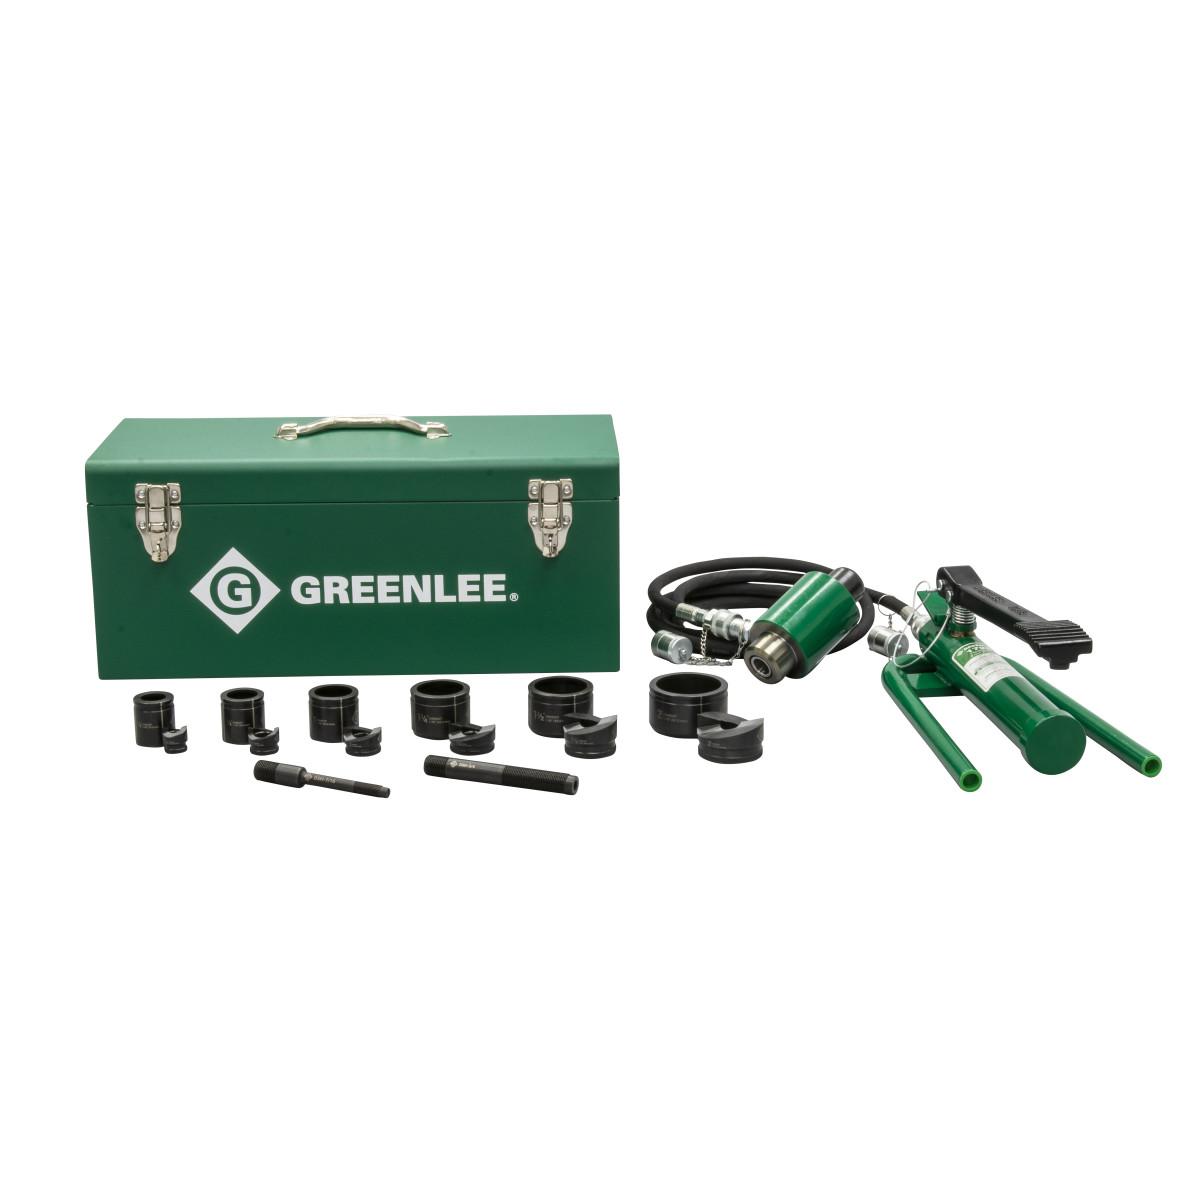 "Greenlee 7606SB Slug-Buster Hydraulc Driver Kit, for 1/2"" - 2"" Conduit"